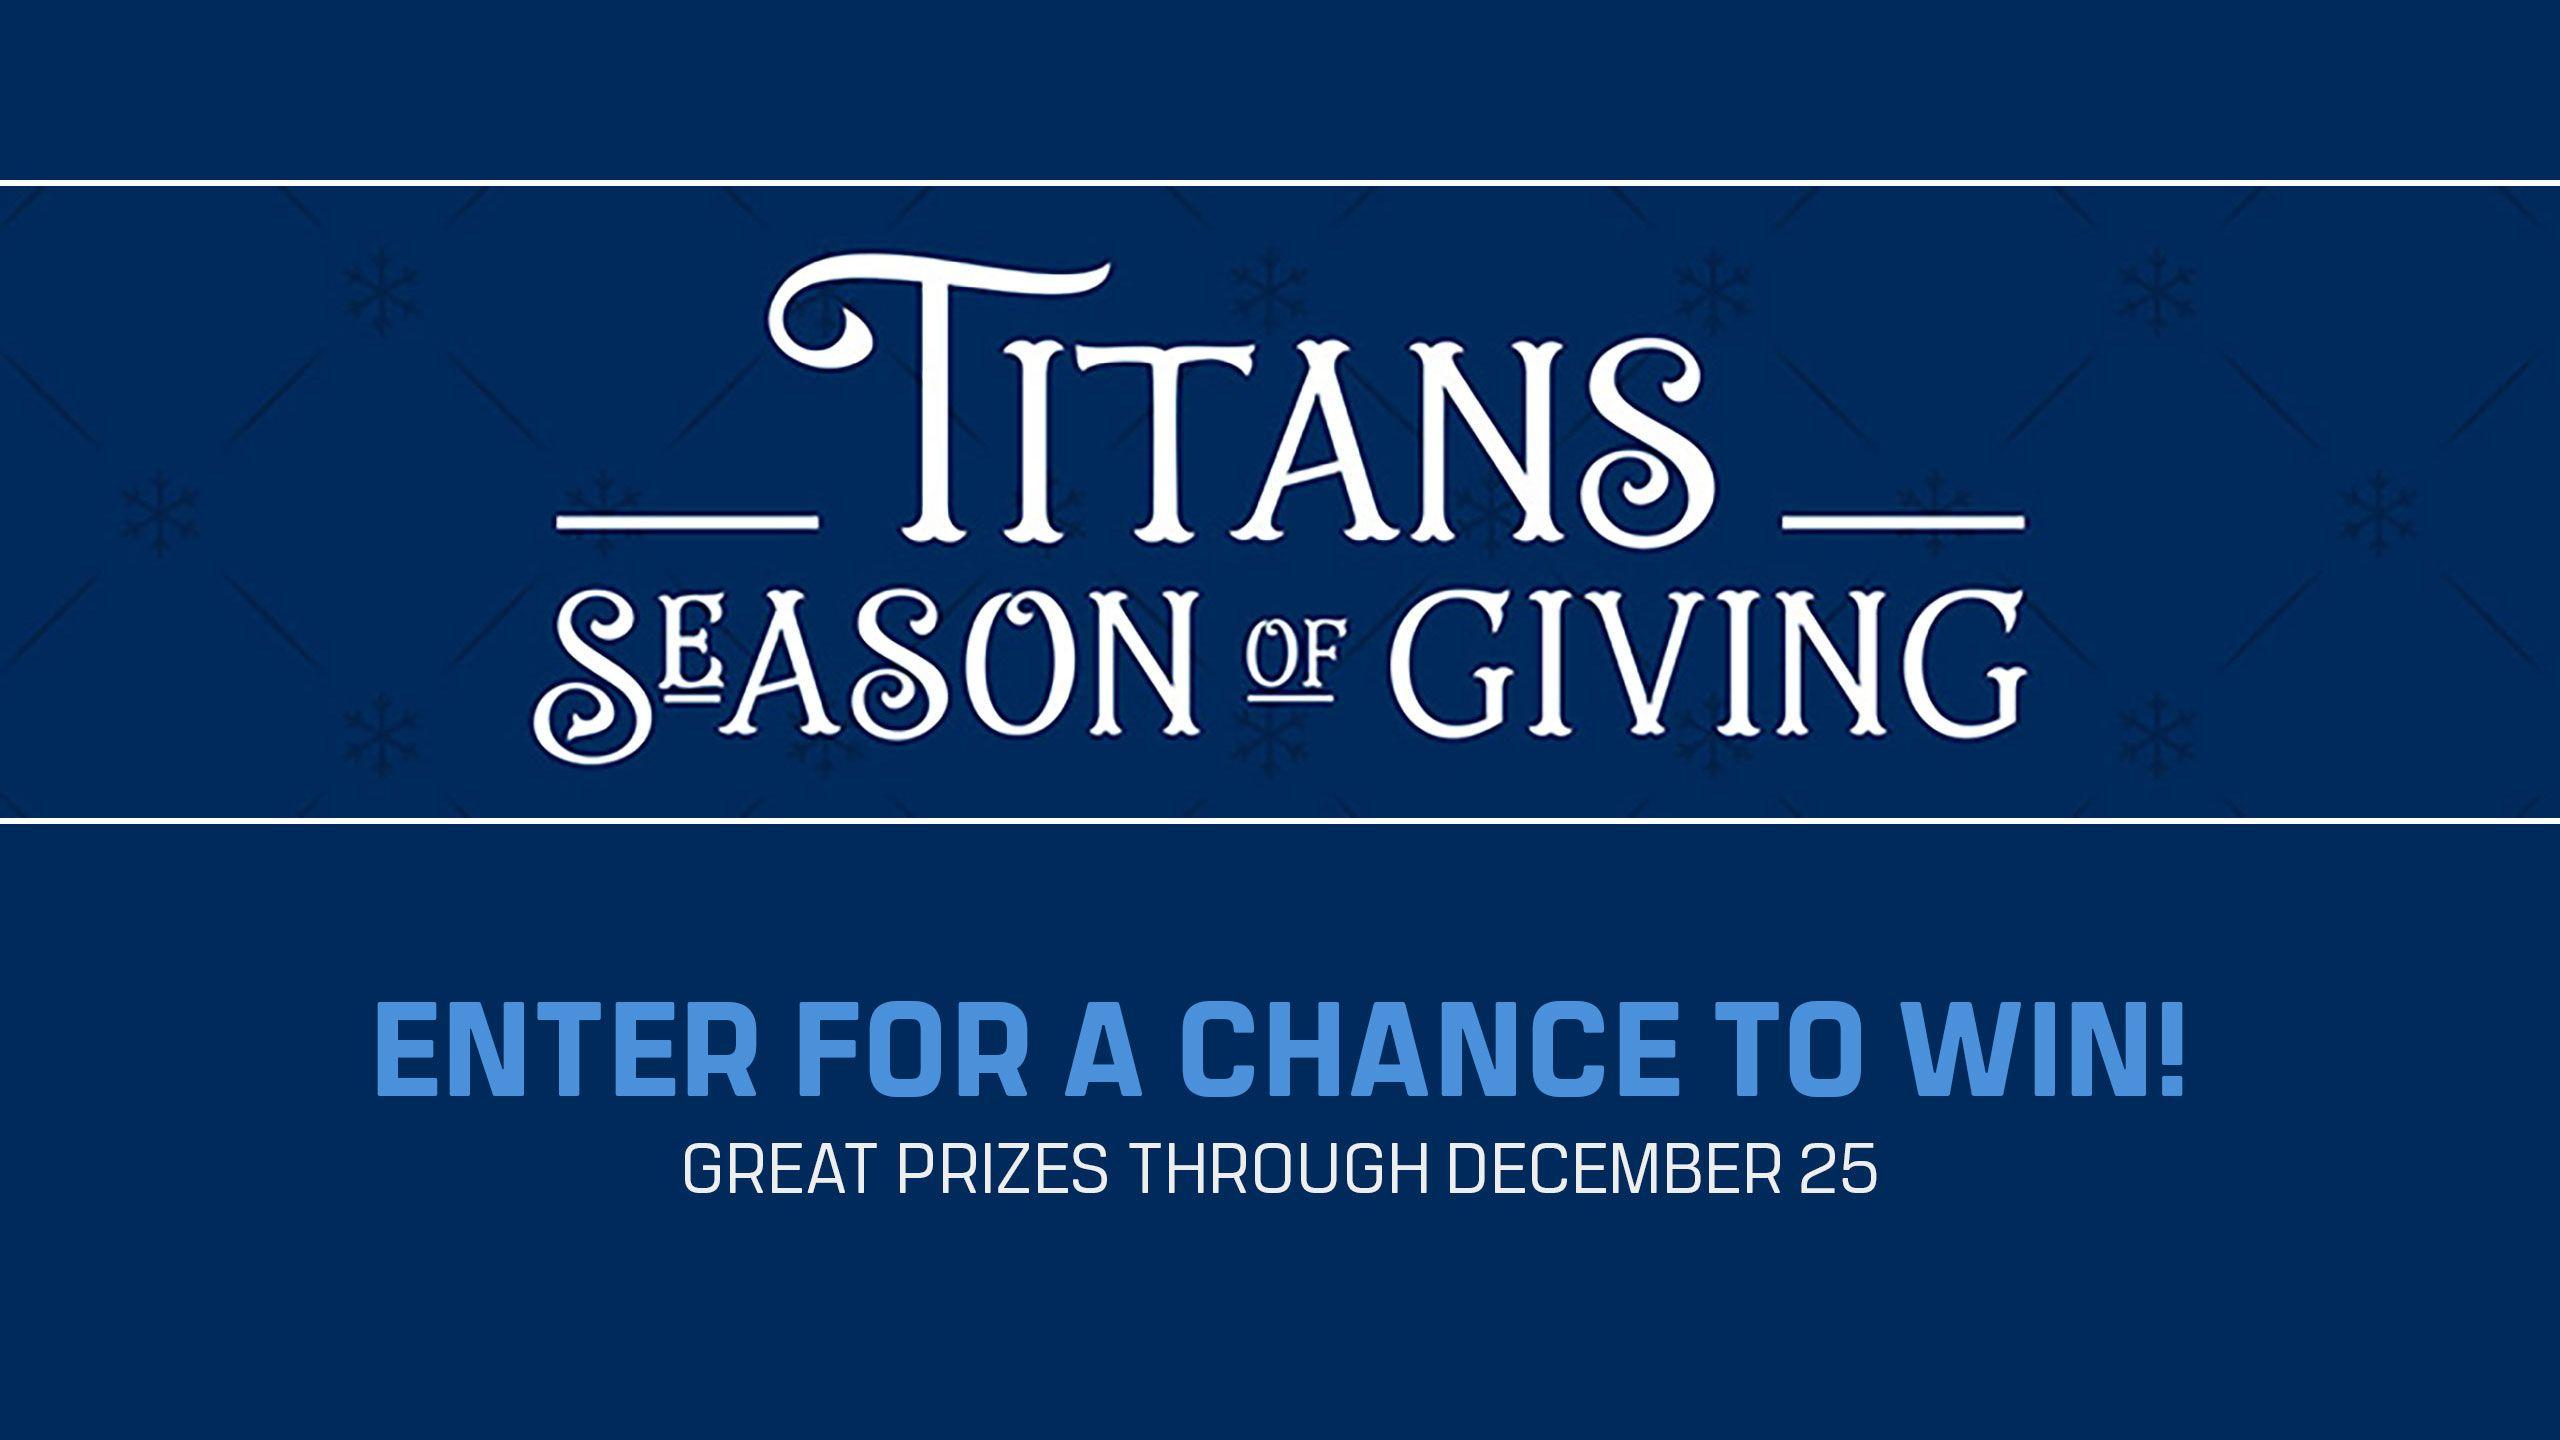 Season of Giving